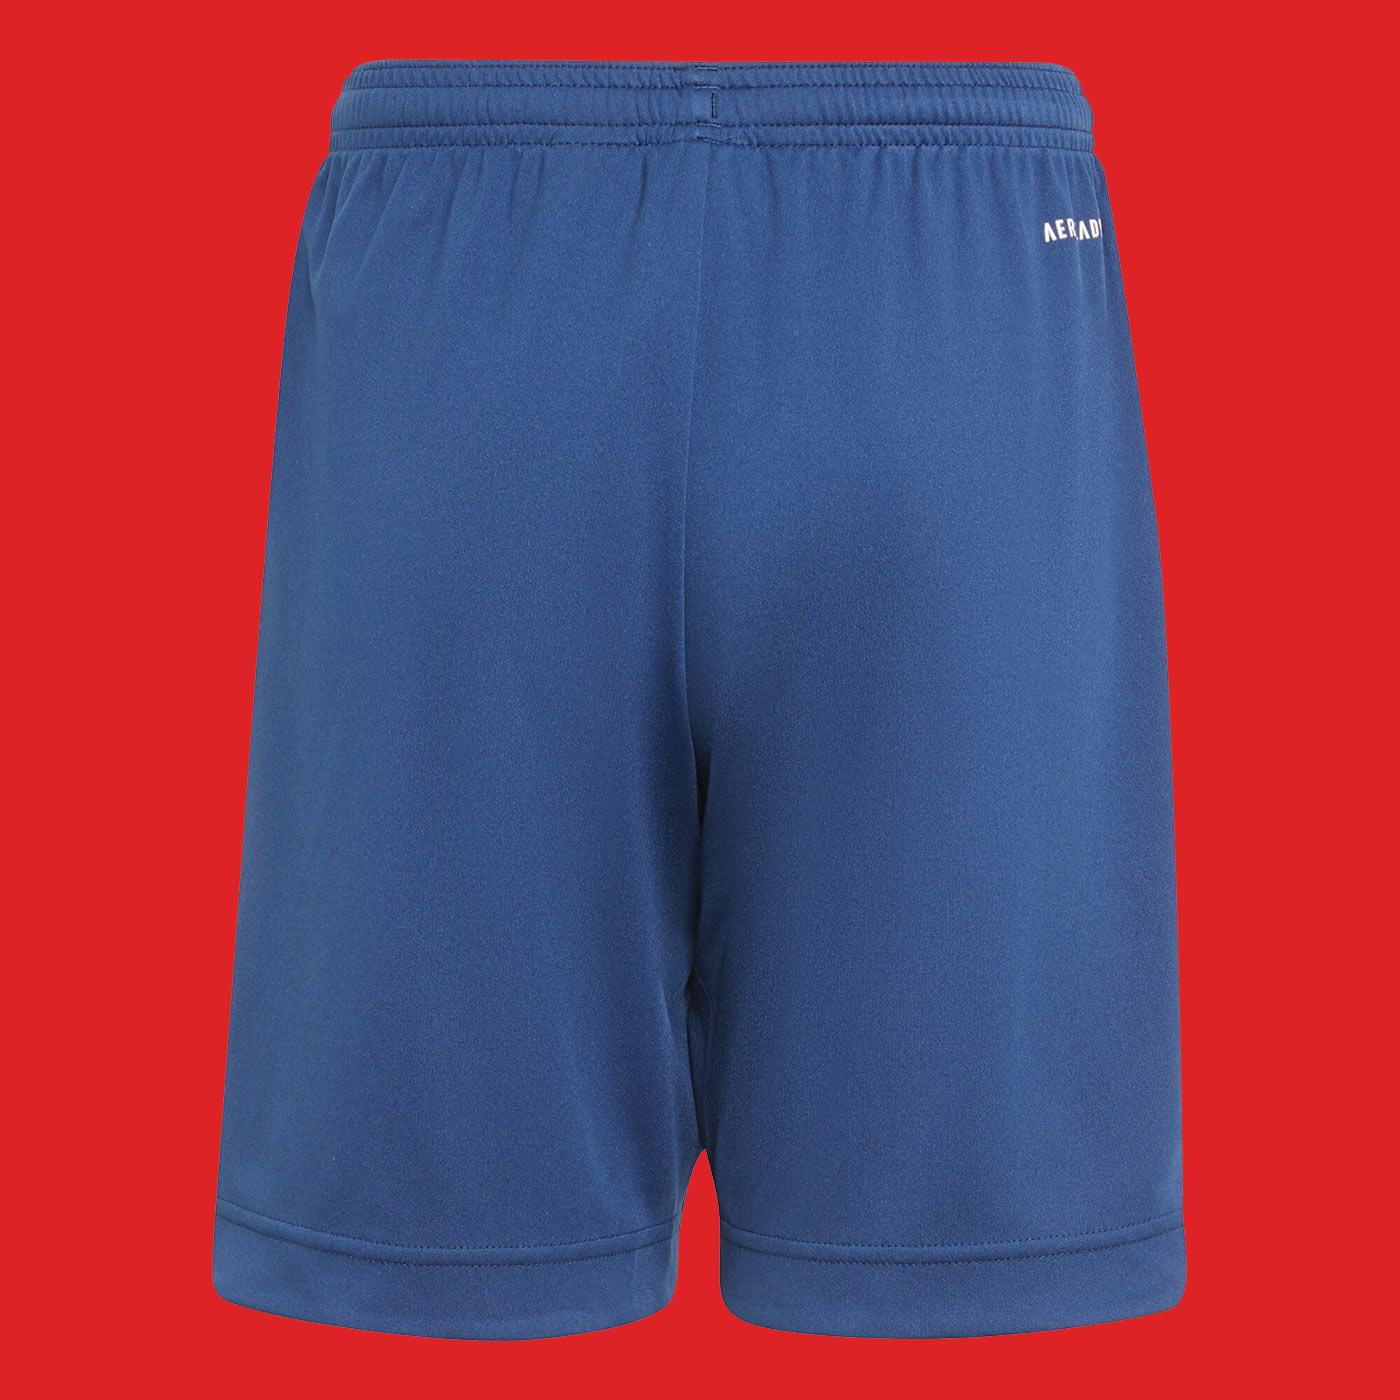 Pantaloncini blu Arsenal 2021-2022 terza divisa